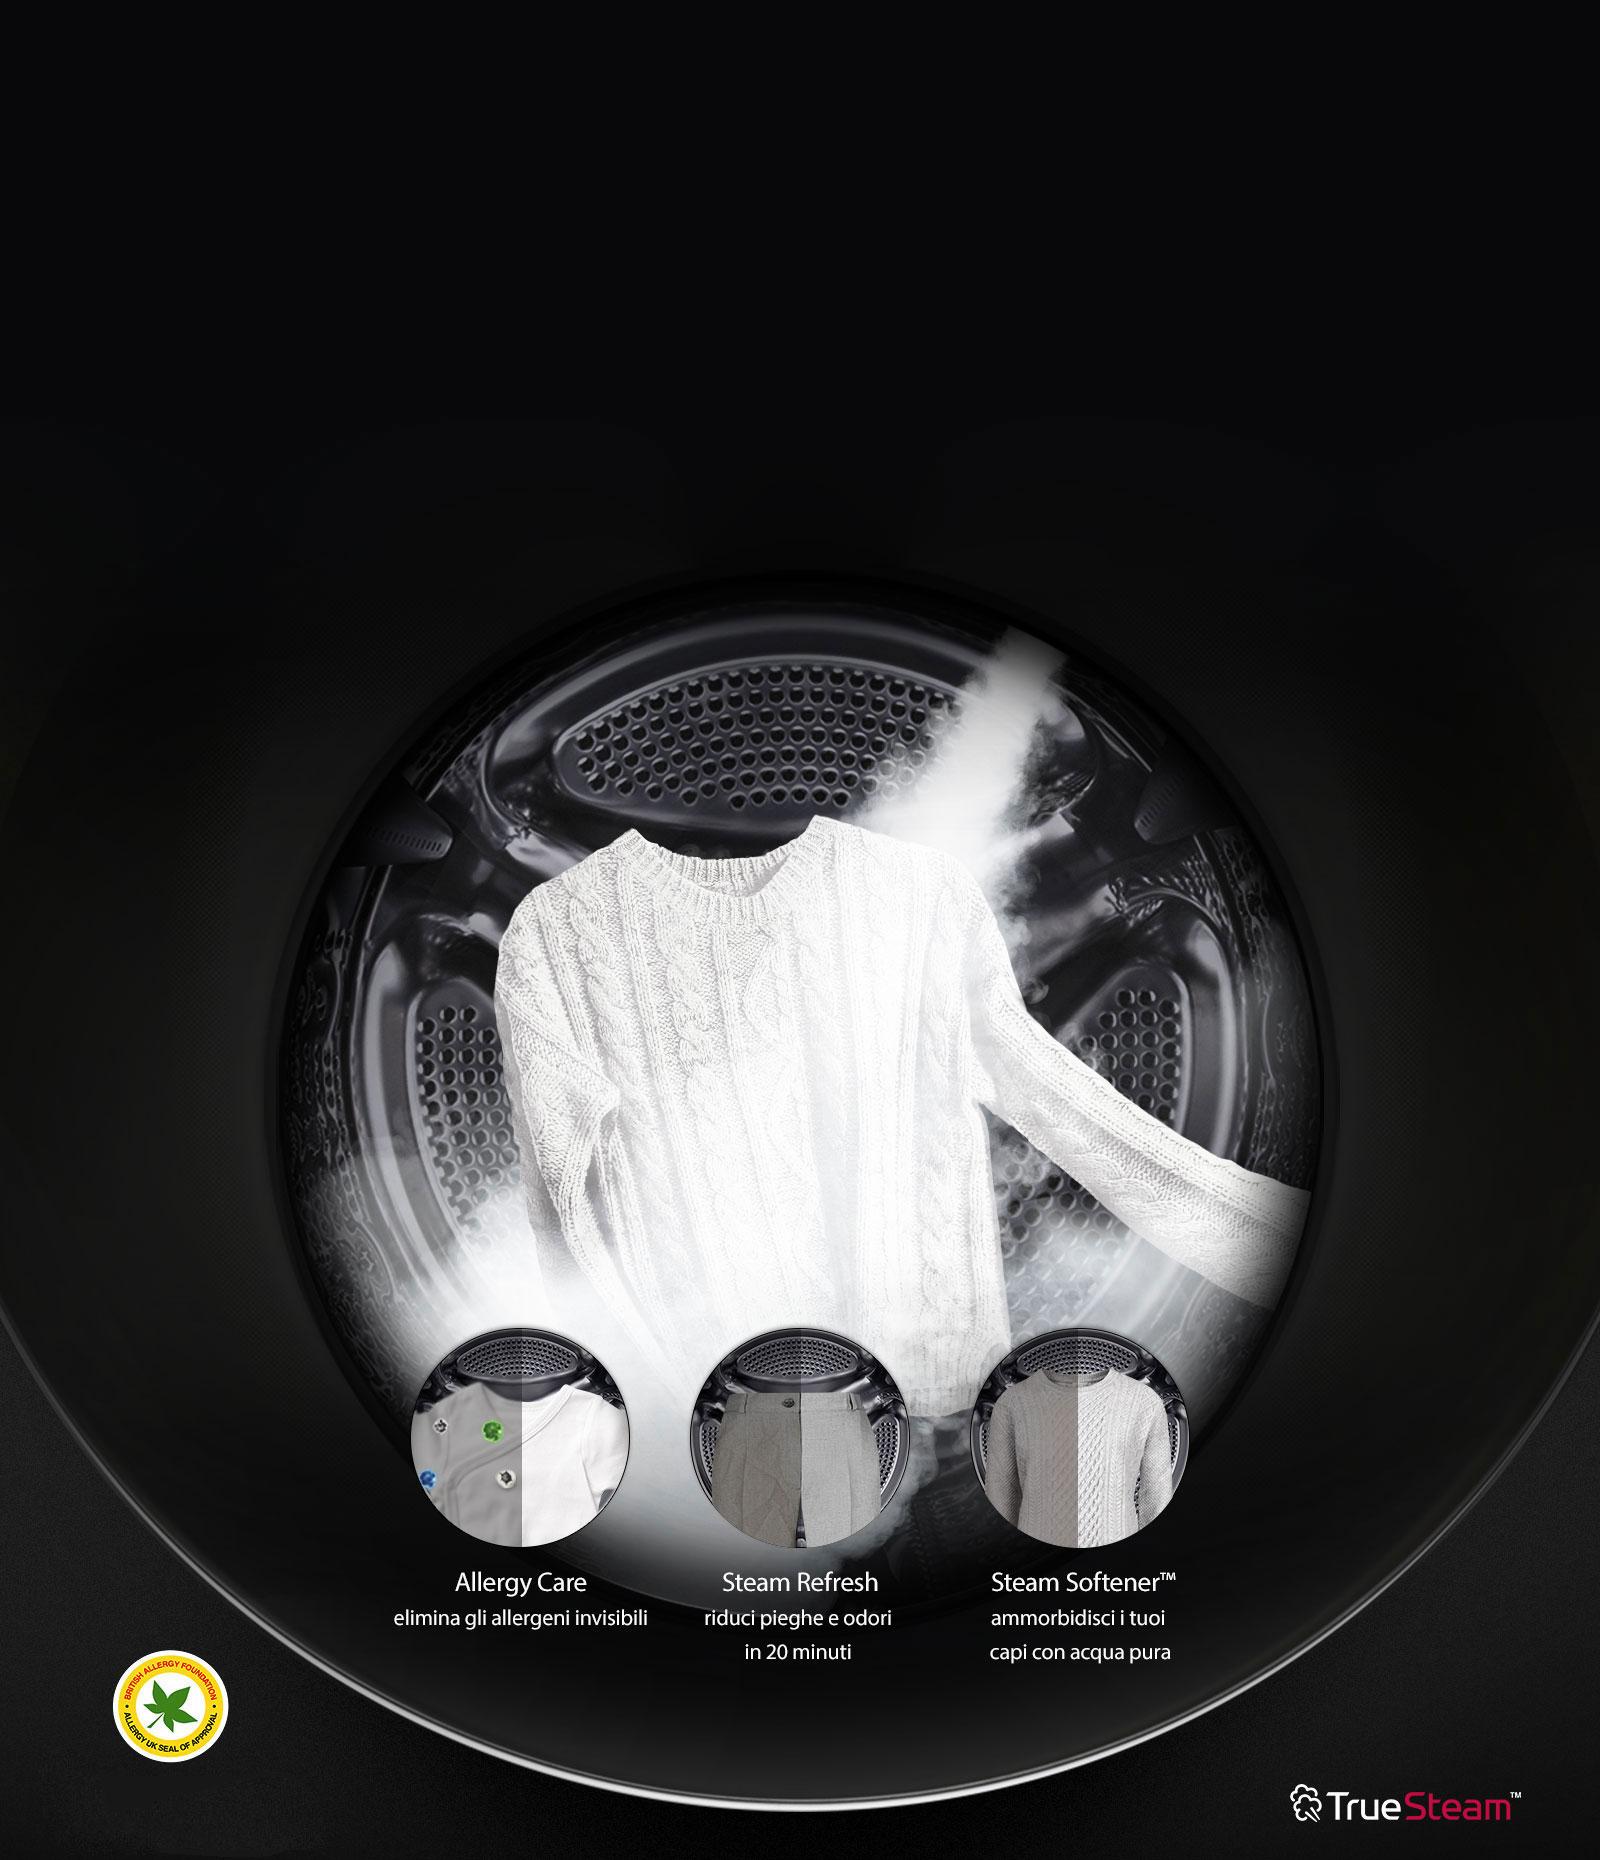 TWINWash™ Steam Care